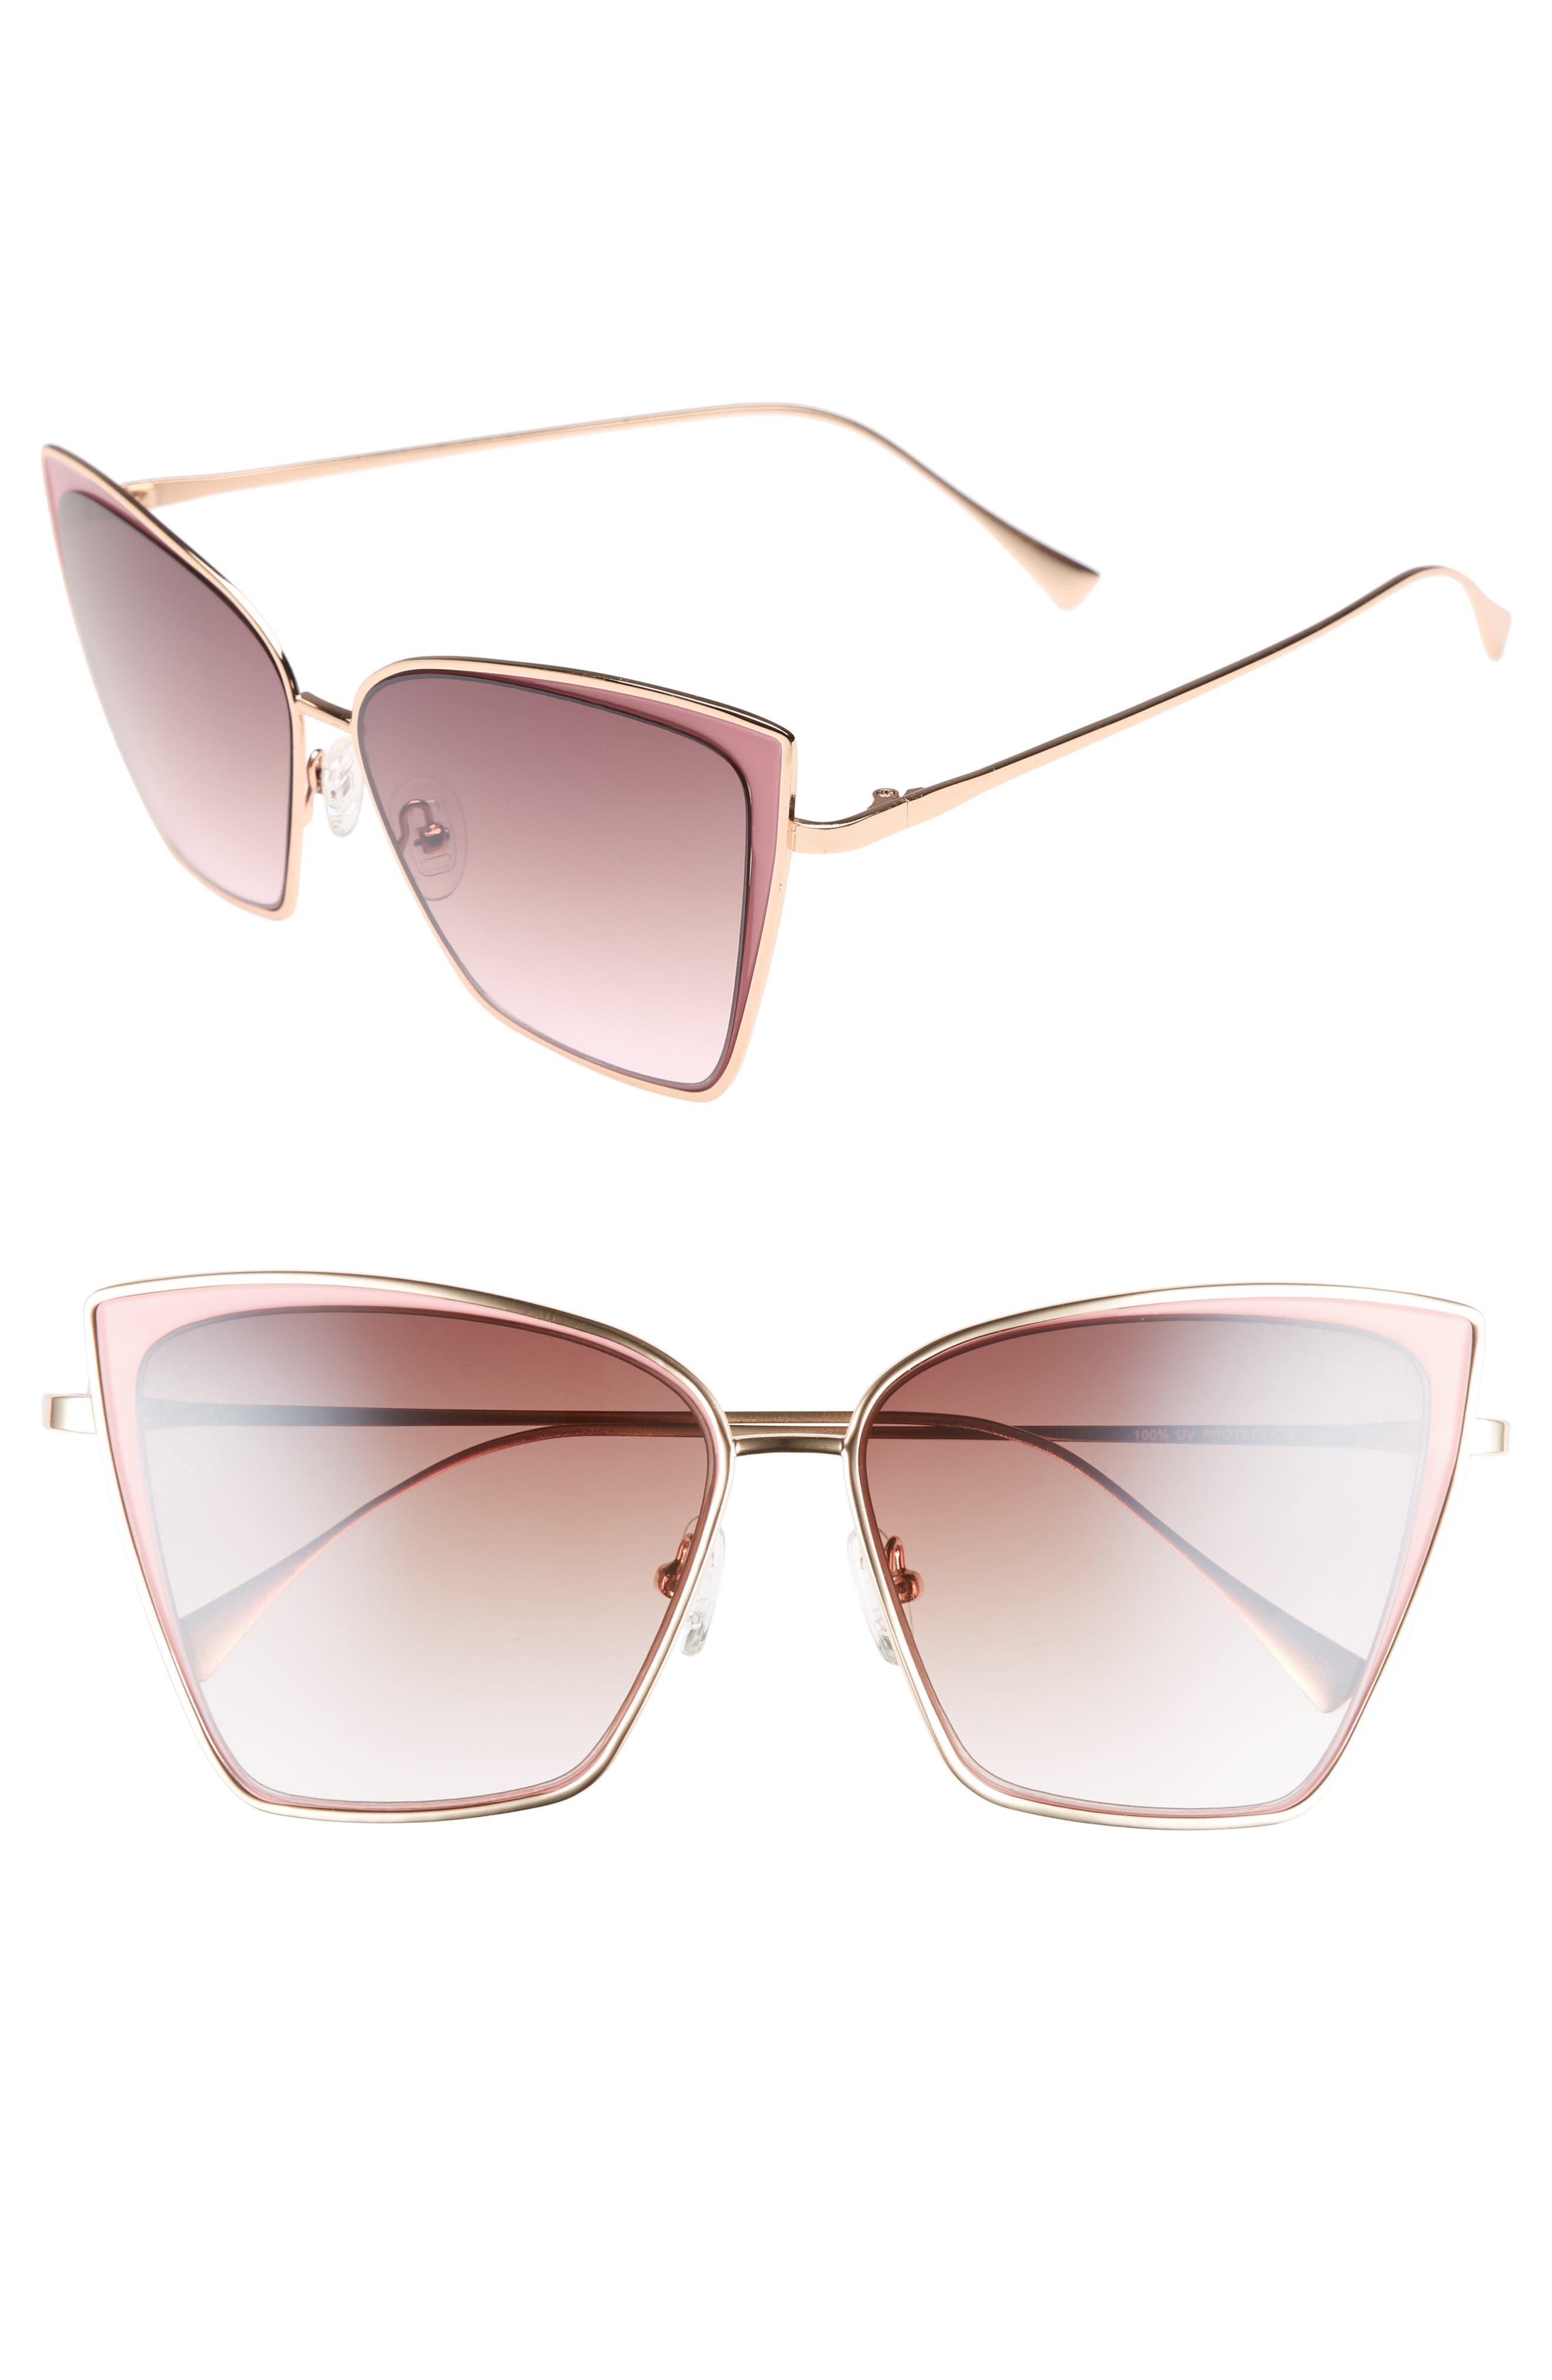 Pinkaboo 58mm Sunglasses,                         Main,                         color, 650